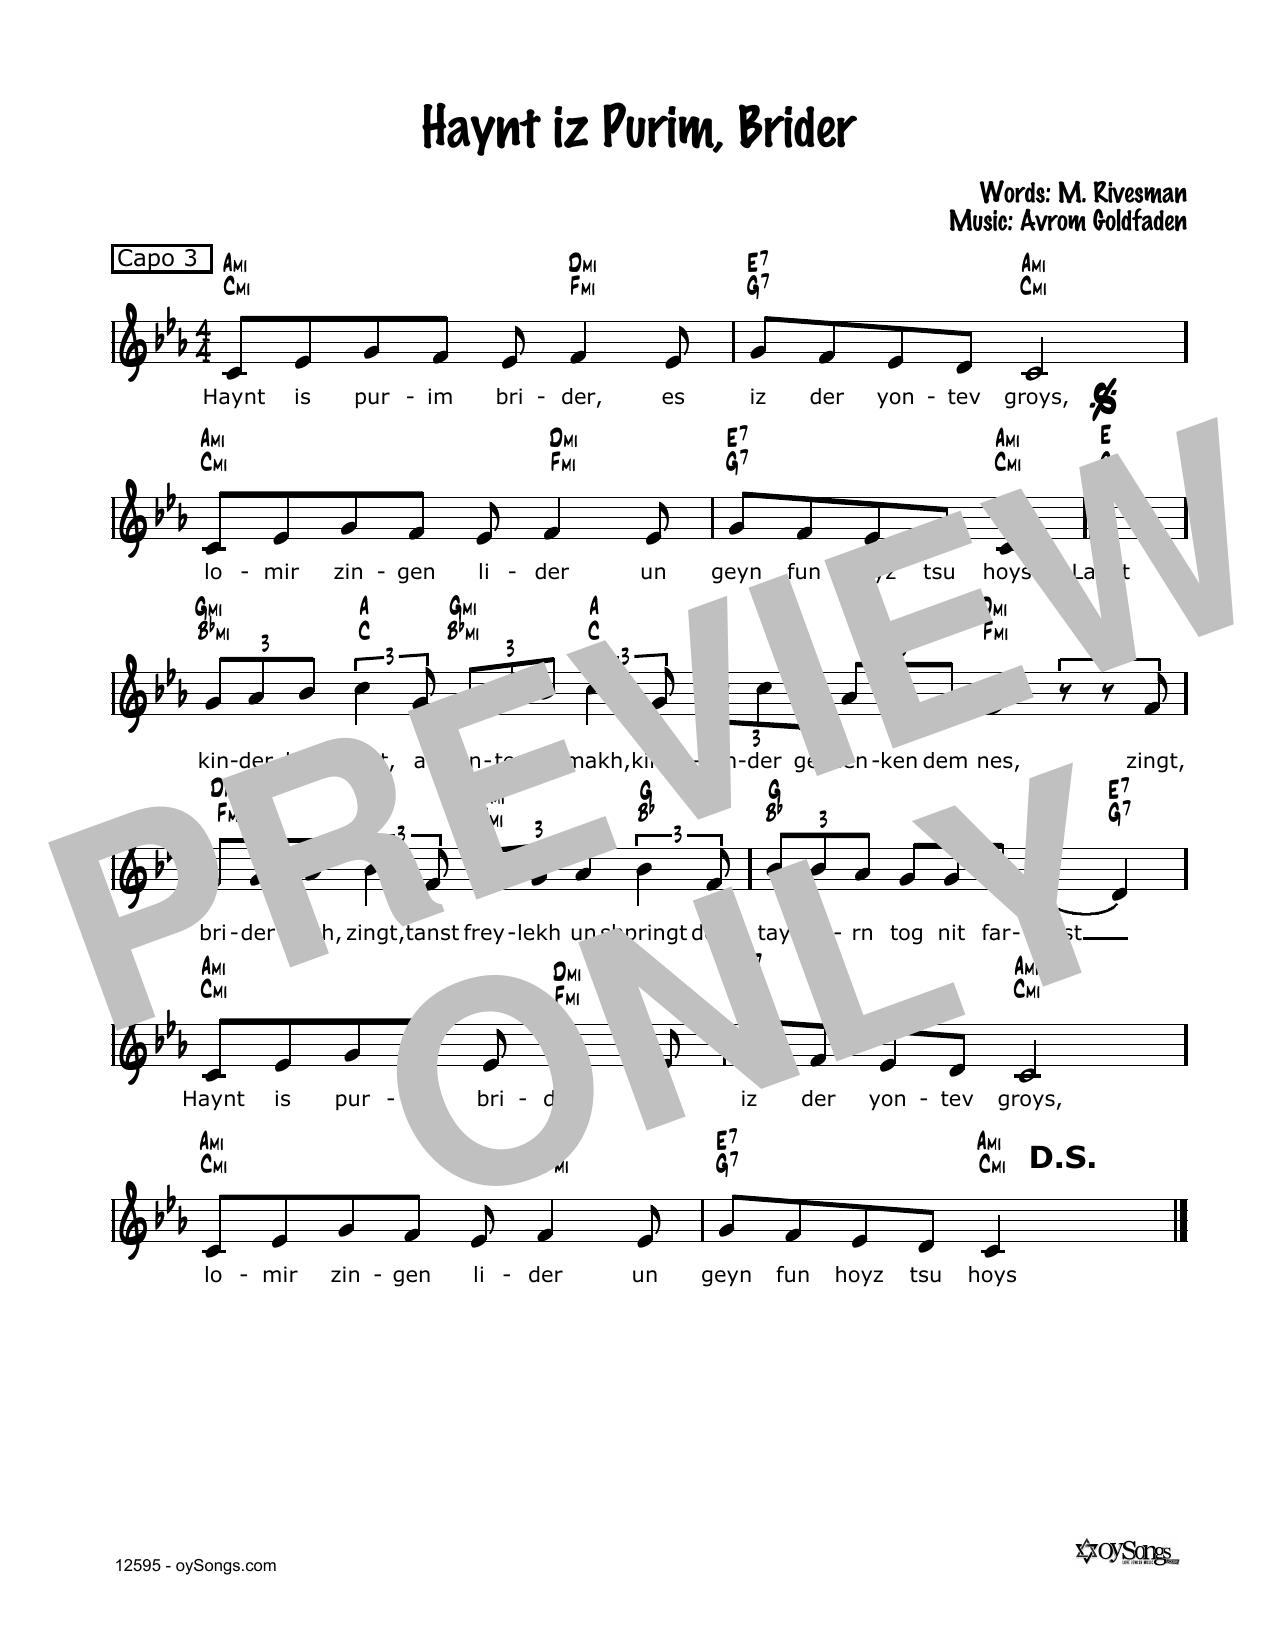 Avrom Goldfaden Haynt Iz Purim, Brider sheet music notes and chords. Download Printable PDF.